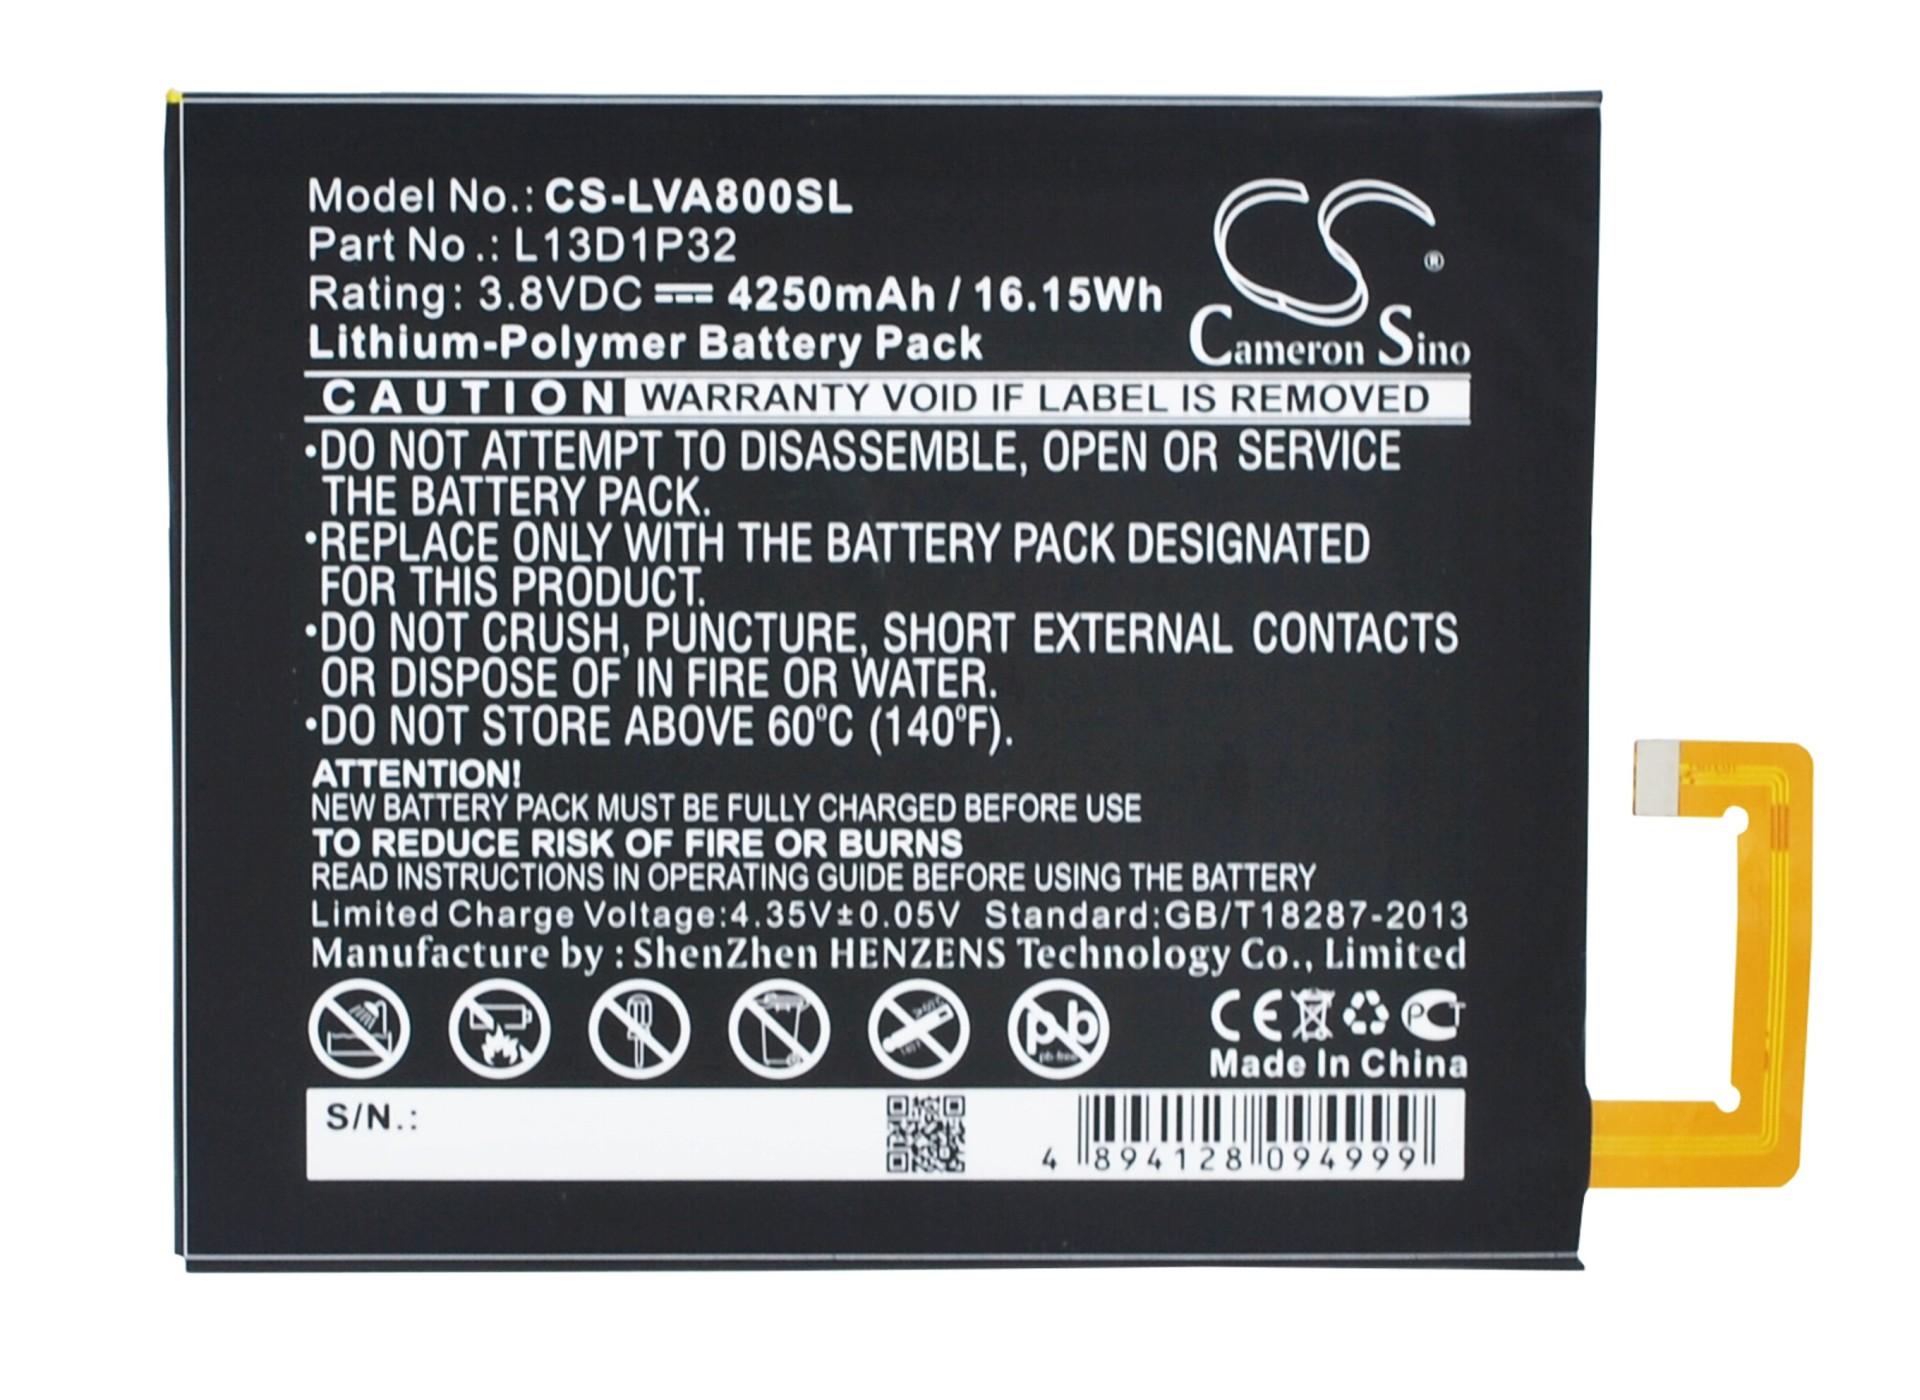 Lenovo IdeaPad A5500 L13D1P32 4250mAh 16 15Wh Li Polymer 3 8V Cameron Sino